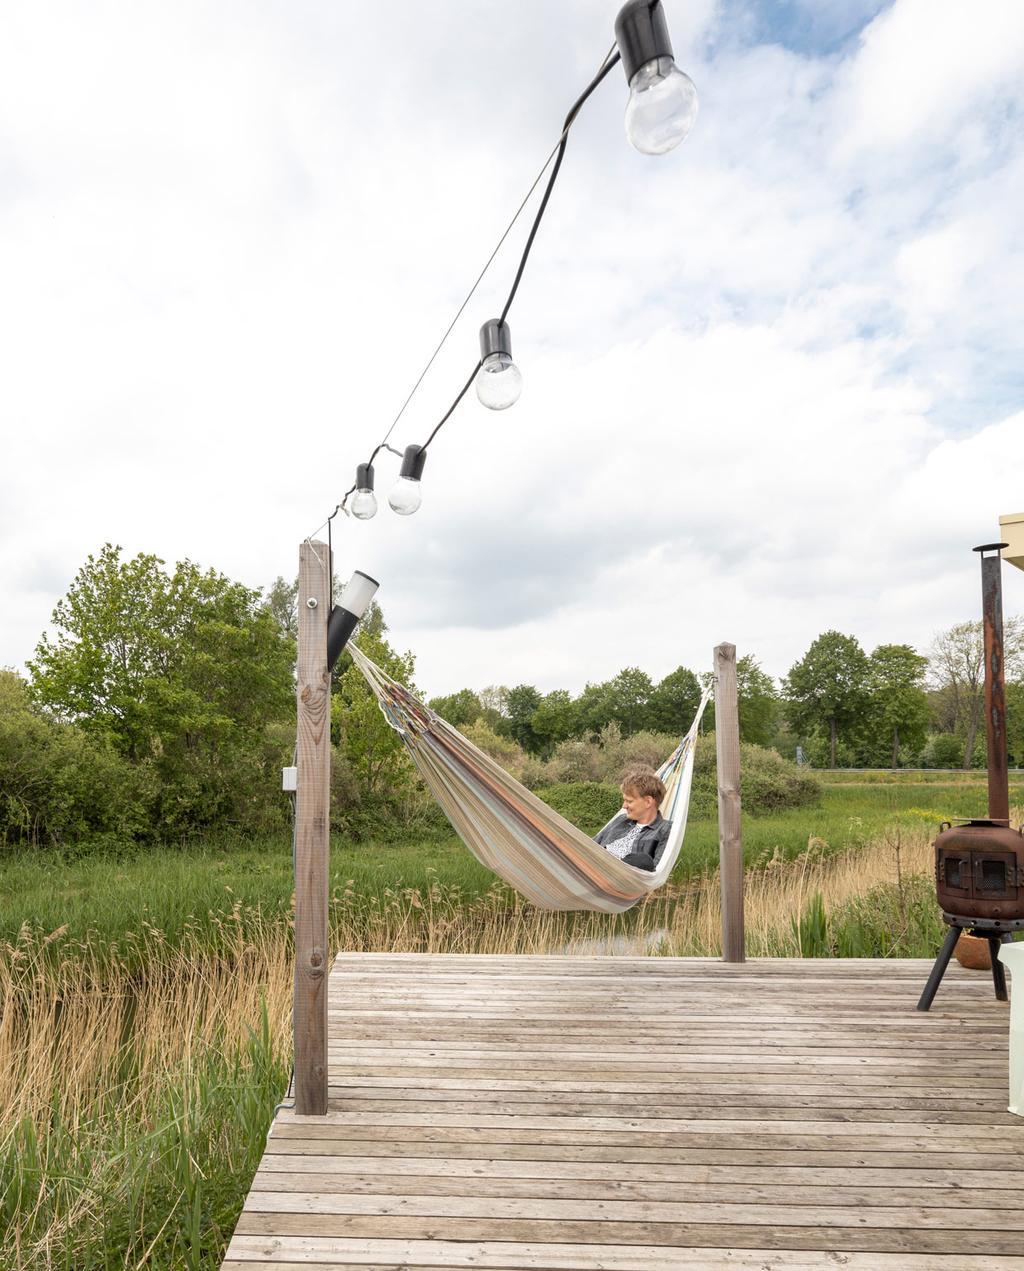 vtwonen special tiny houses | hangmat op de veranda van tiny house